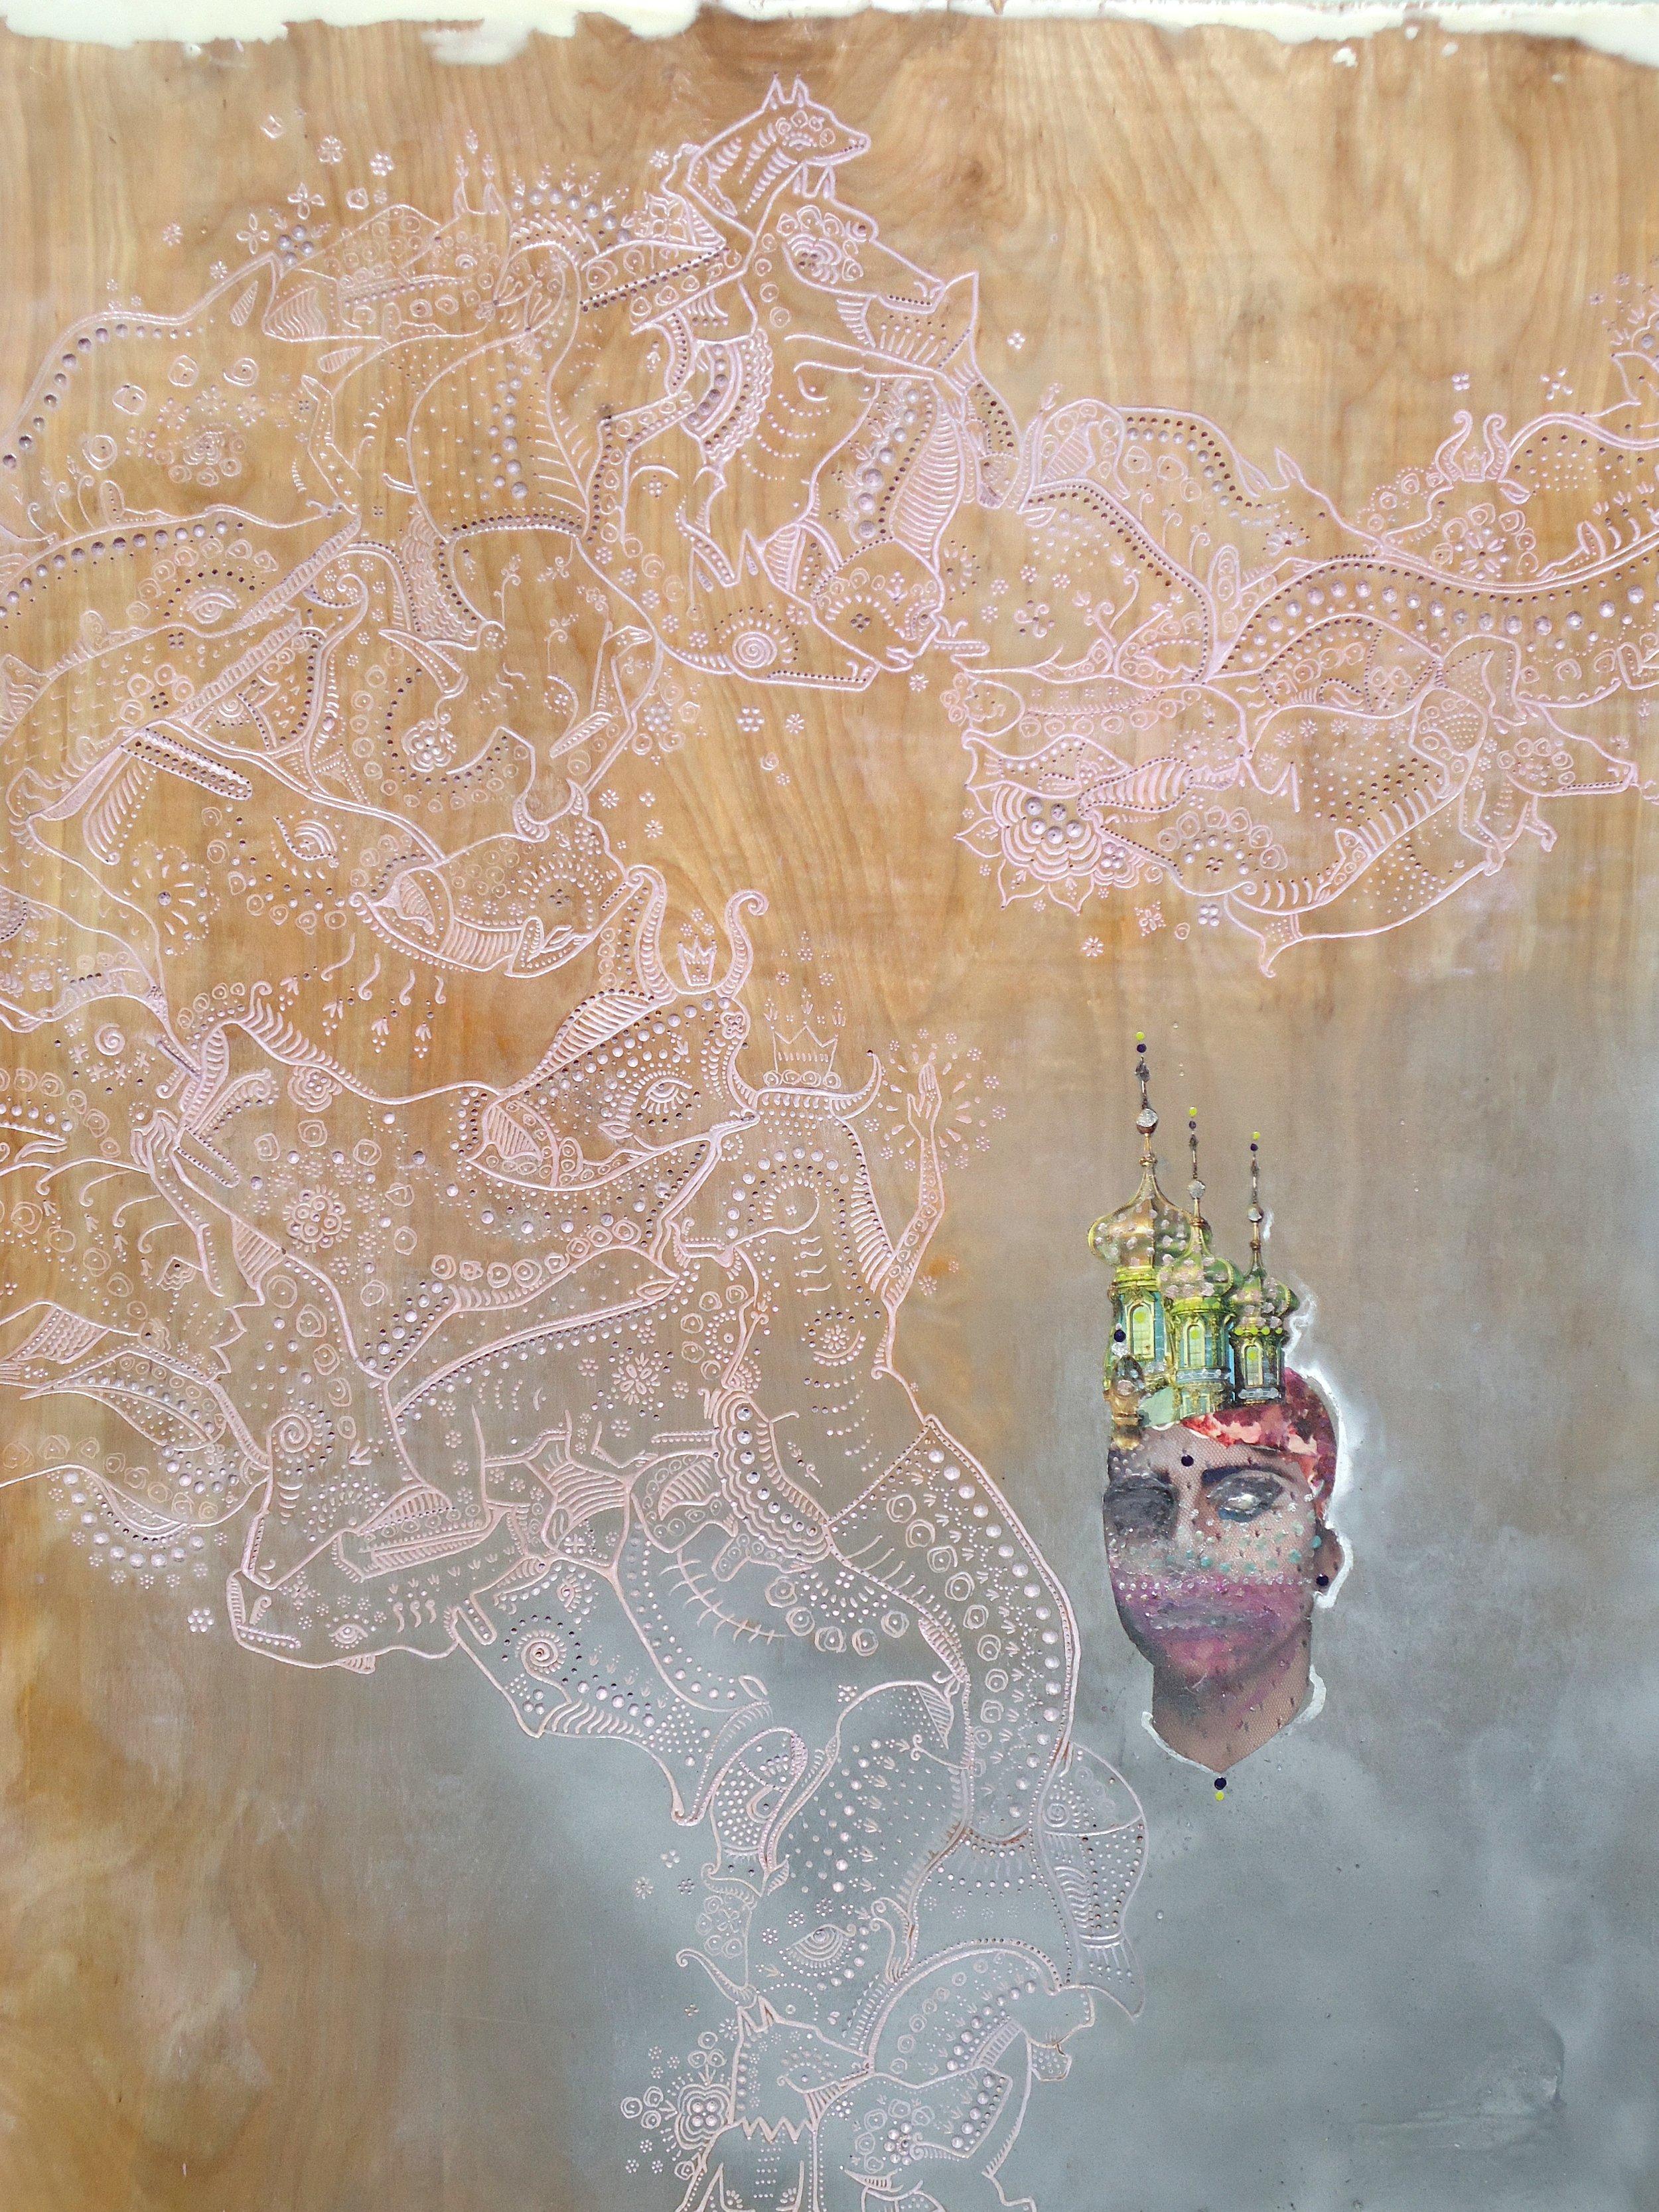 Jason-Borders-paintings-carvings-juxtapoz.JPG